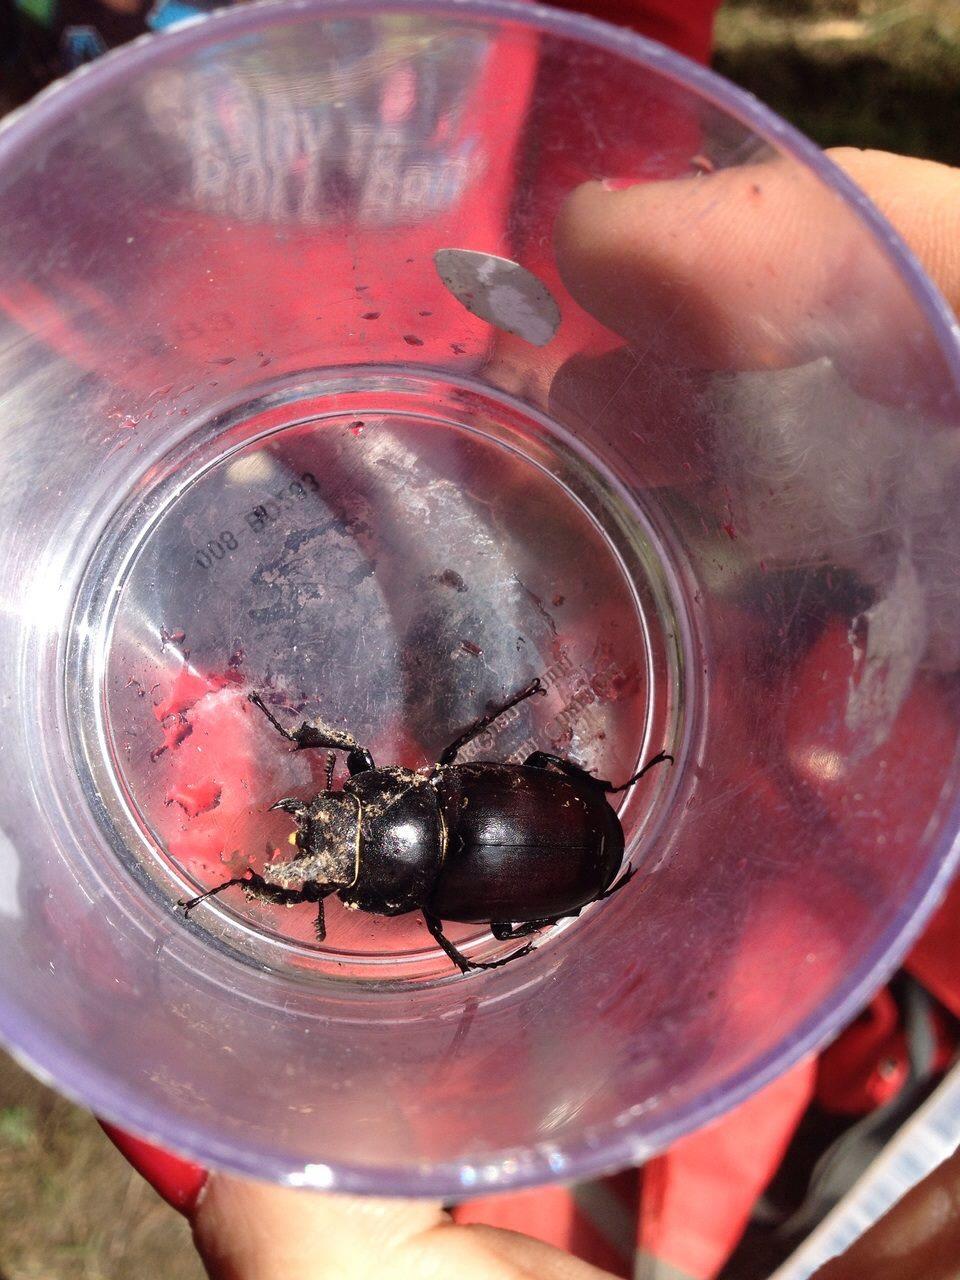 lff-summercamp-wk2-beetle.jpg